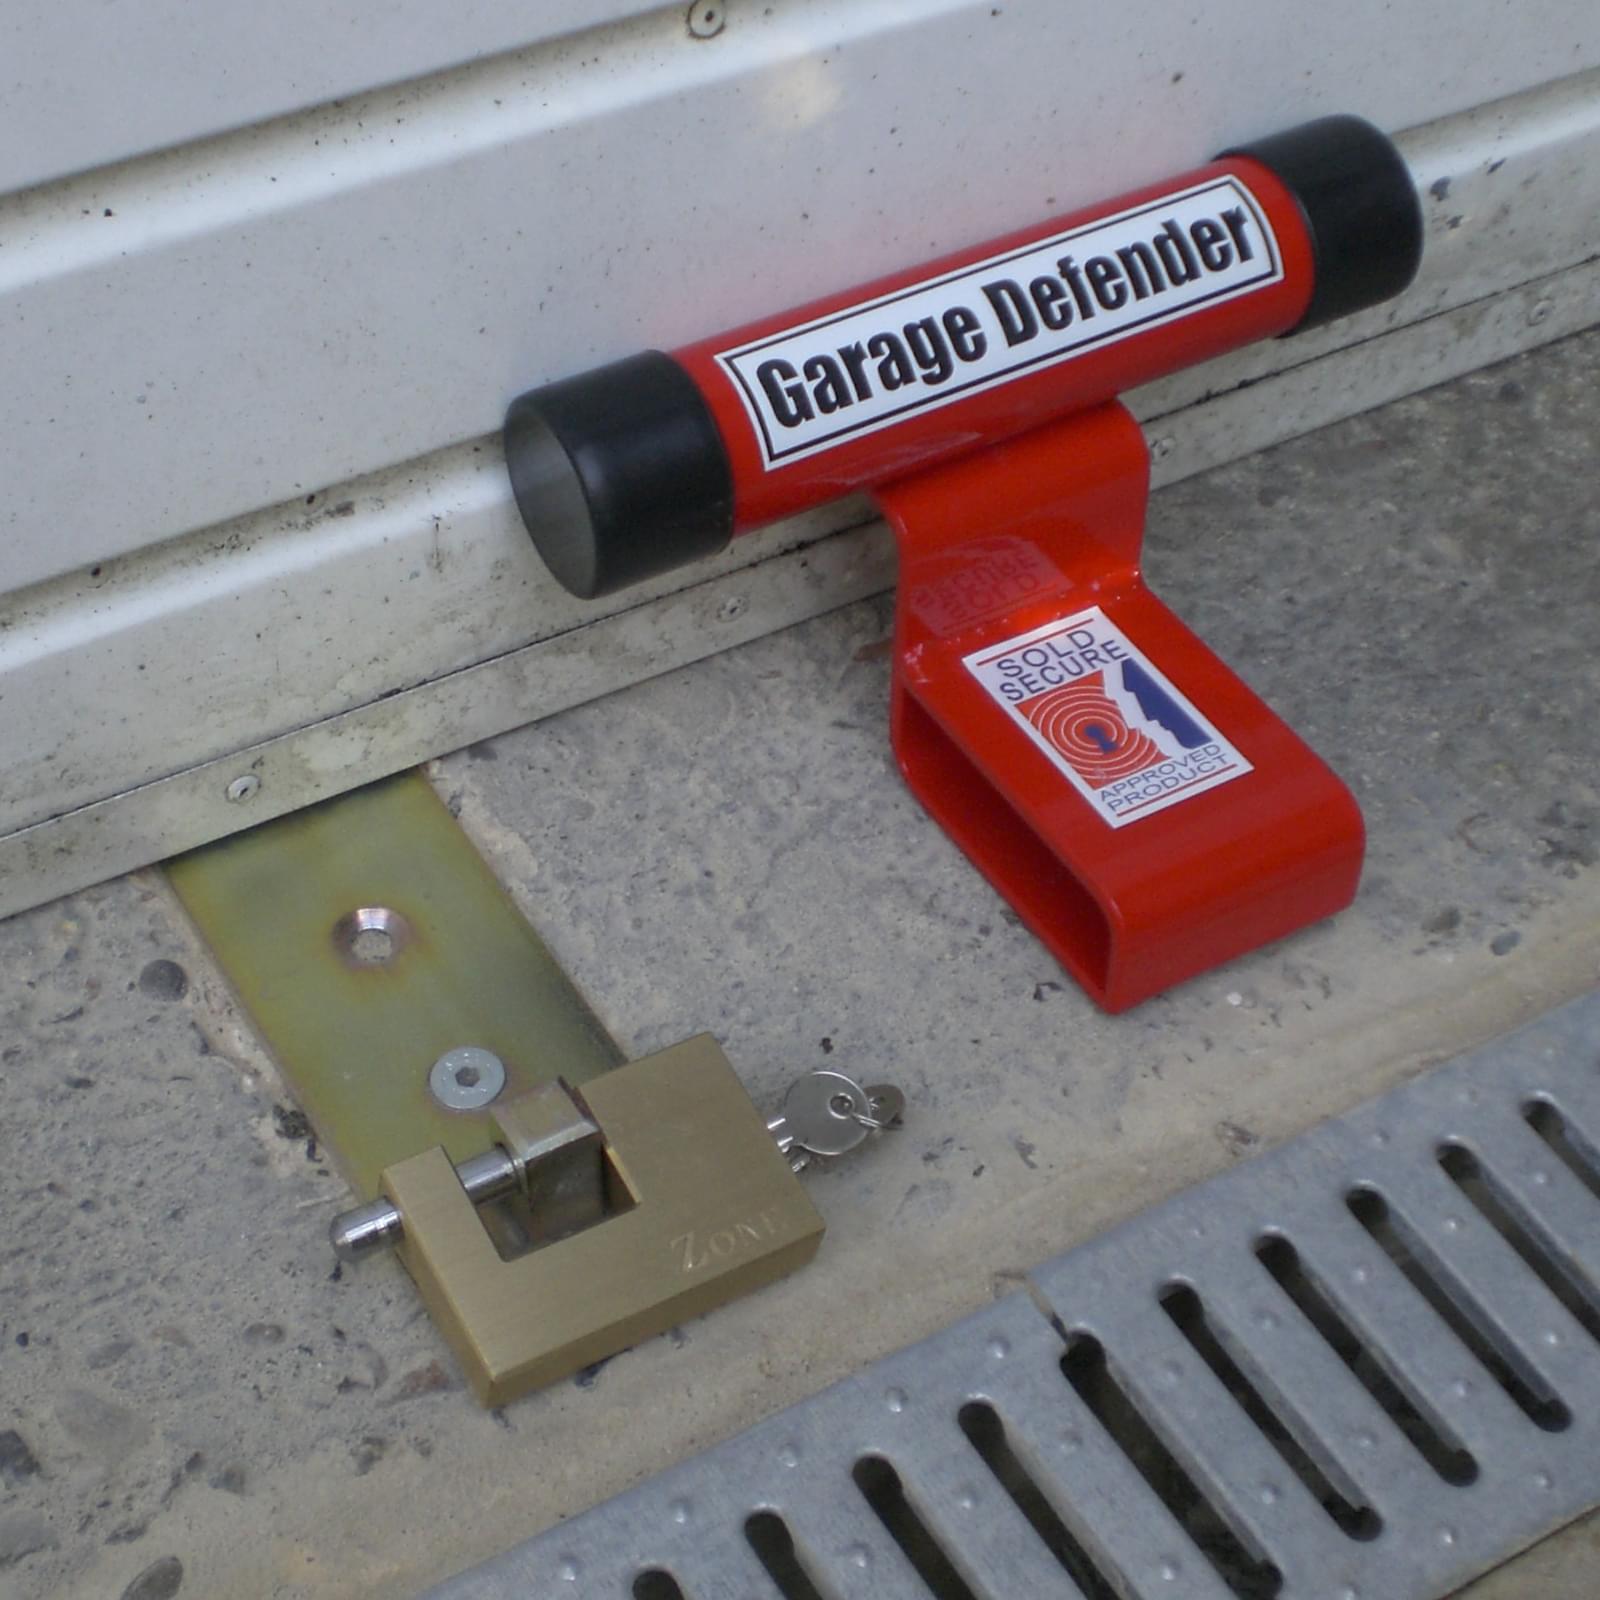 garage defender and lock